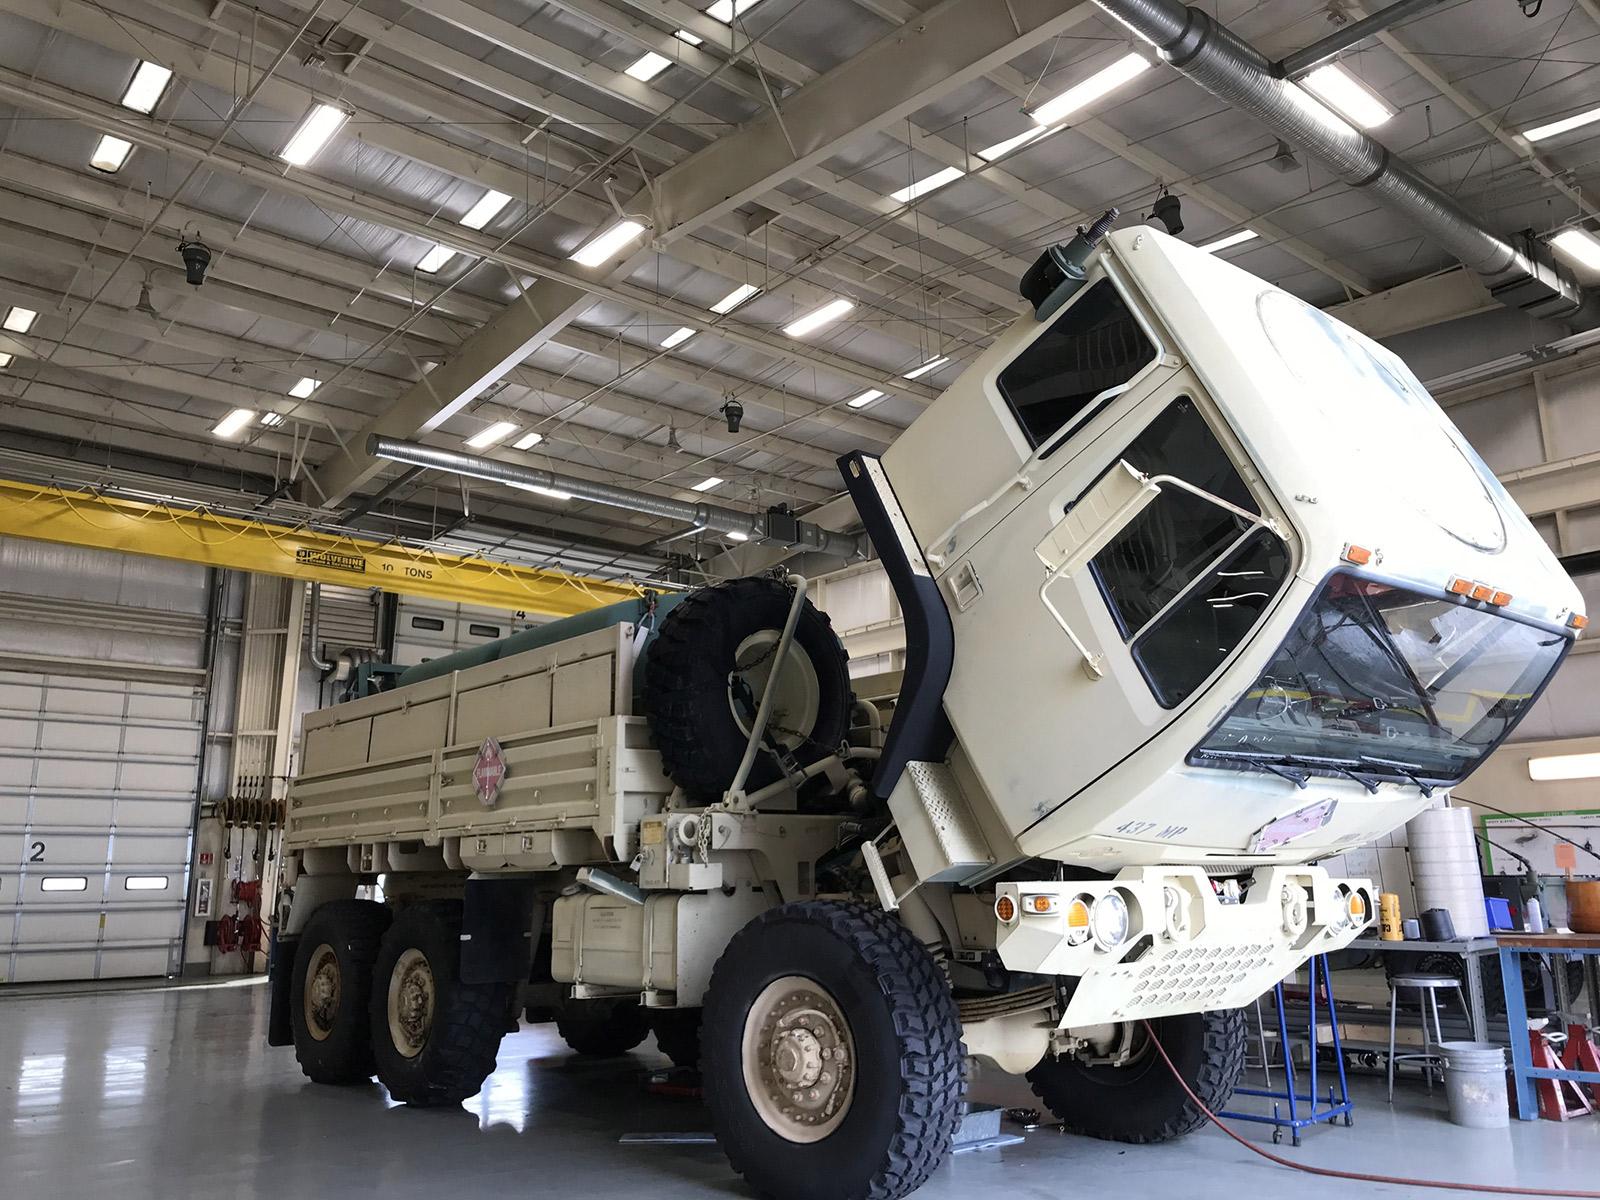 IK10 Lighting Ohio National Guard Depot with Truck